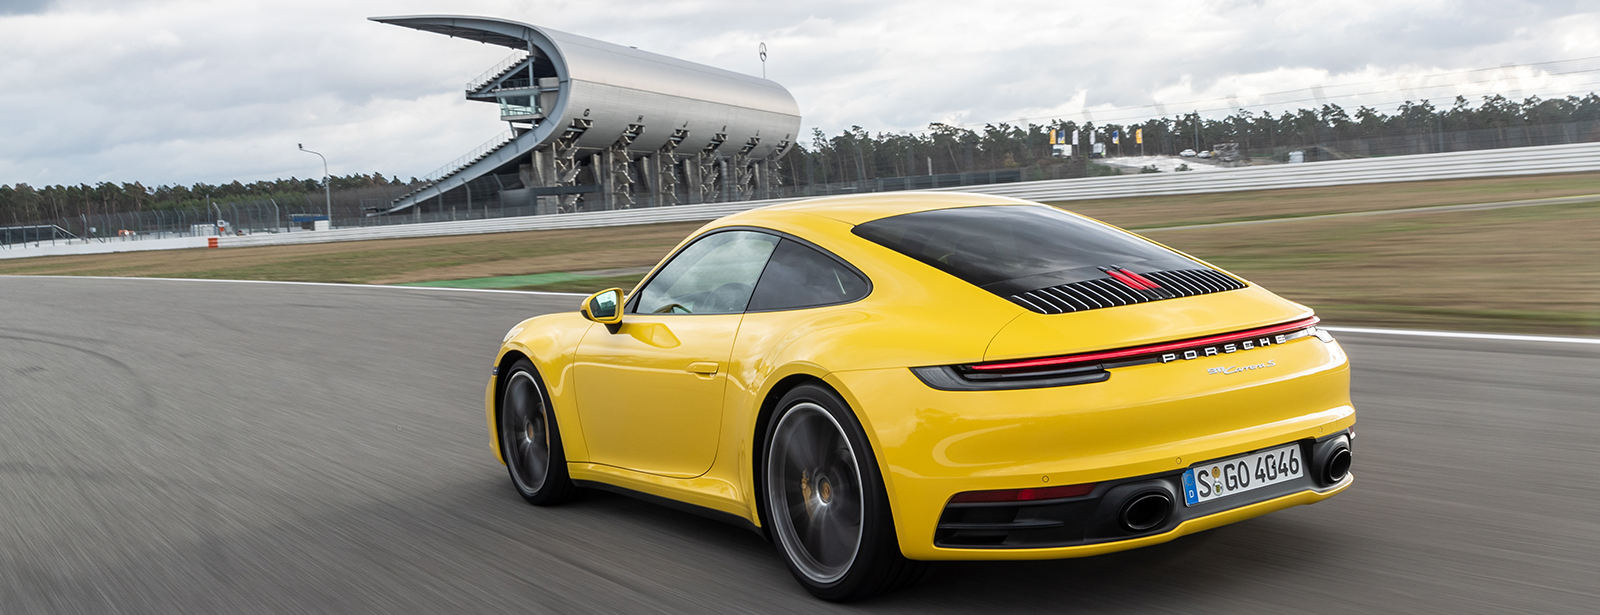 Porsche Macan Gts >> 911 カレラS - ポルシェパブリックリレーション